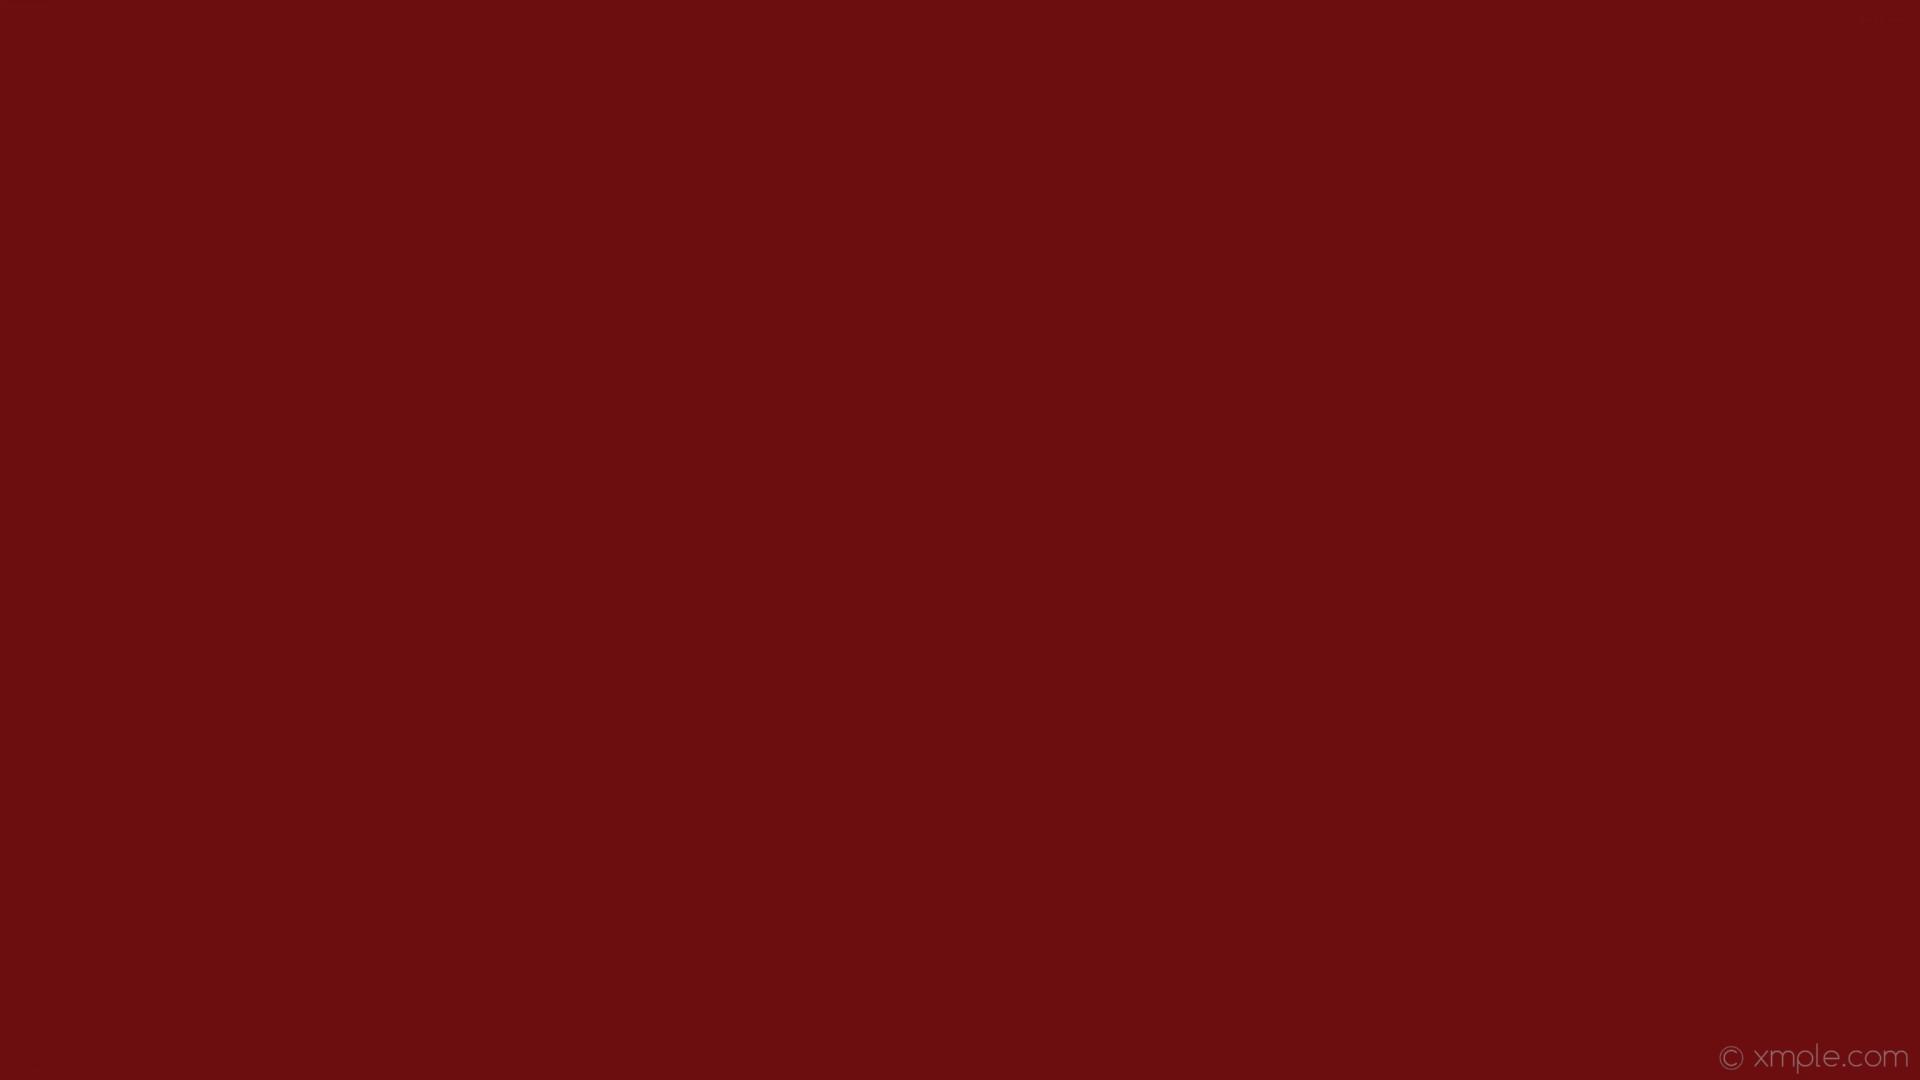 wallpaper single solid color red one colour plain #6c0d0f